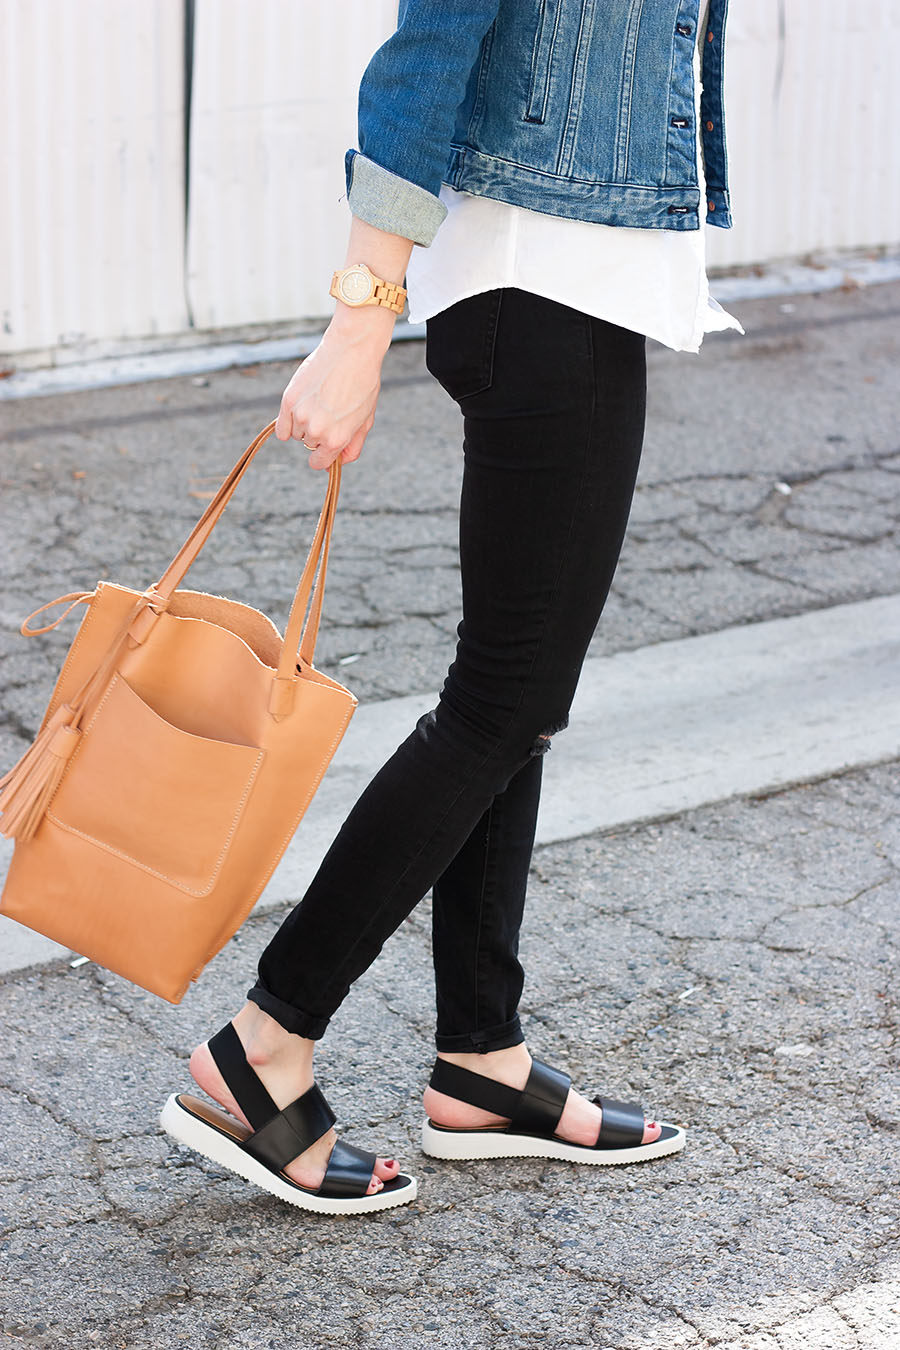 Everlane, Everlane Street Sandal, Leather Tote Bag, Black Skinny Jeans, Jord Watch